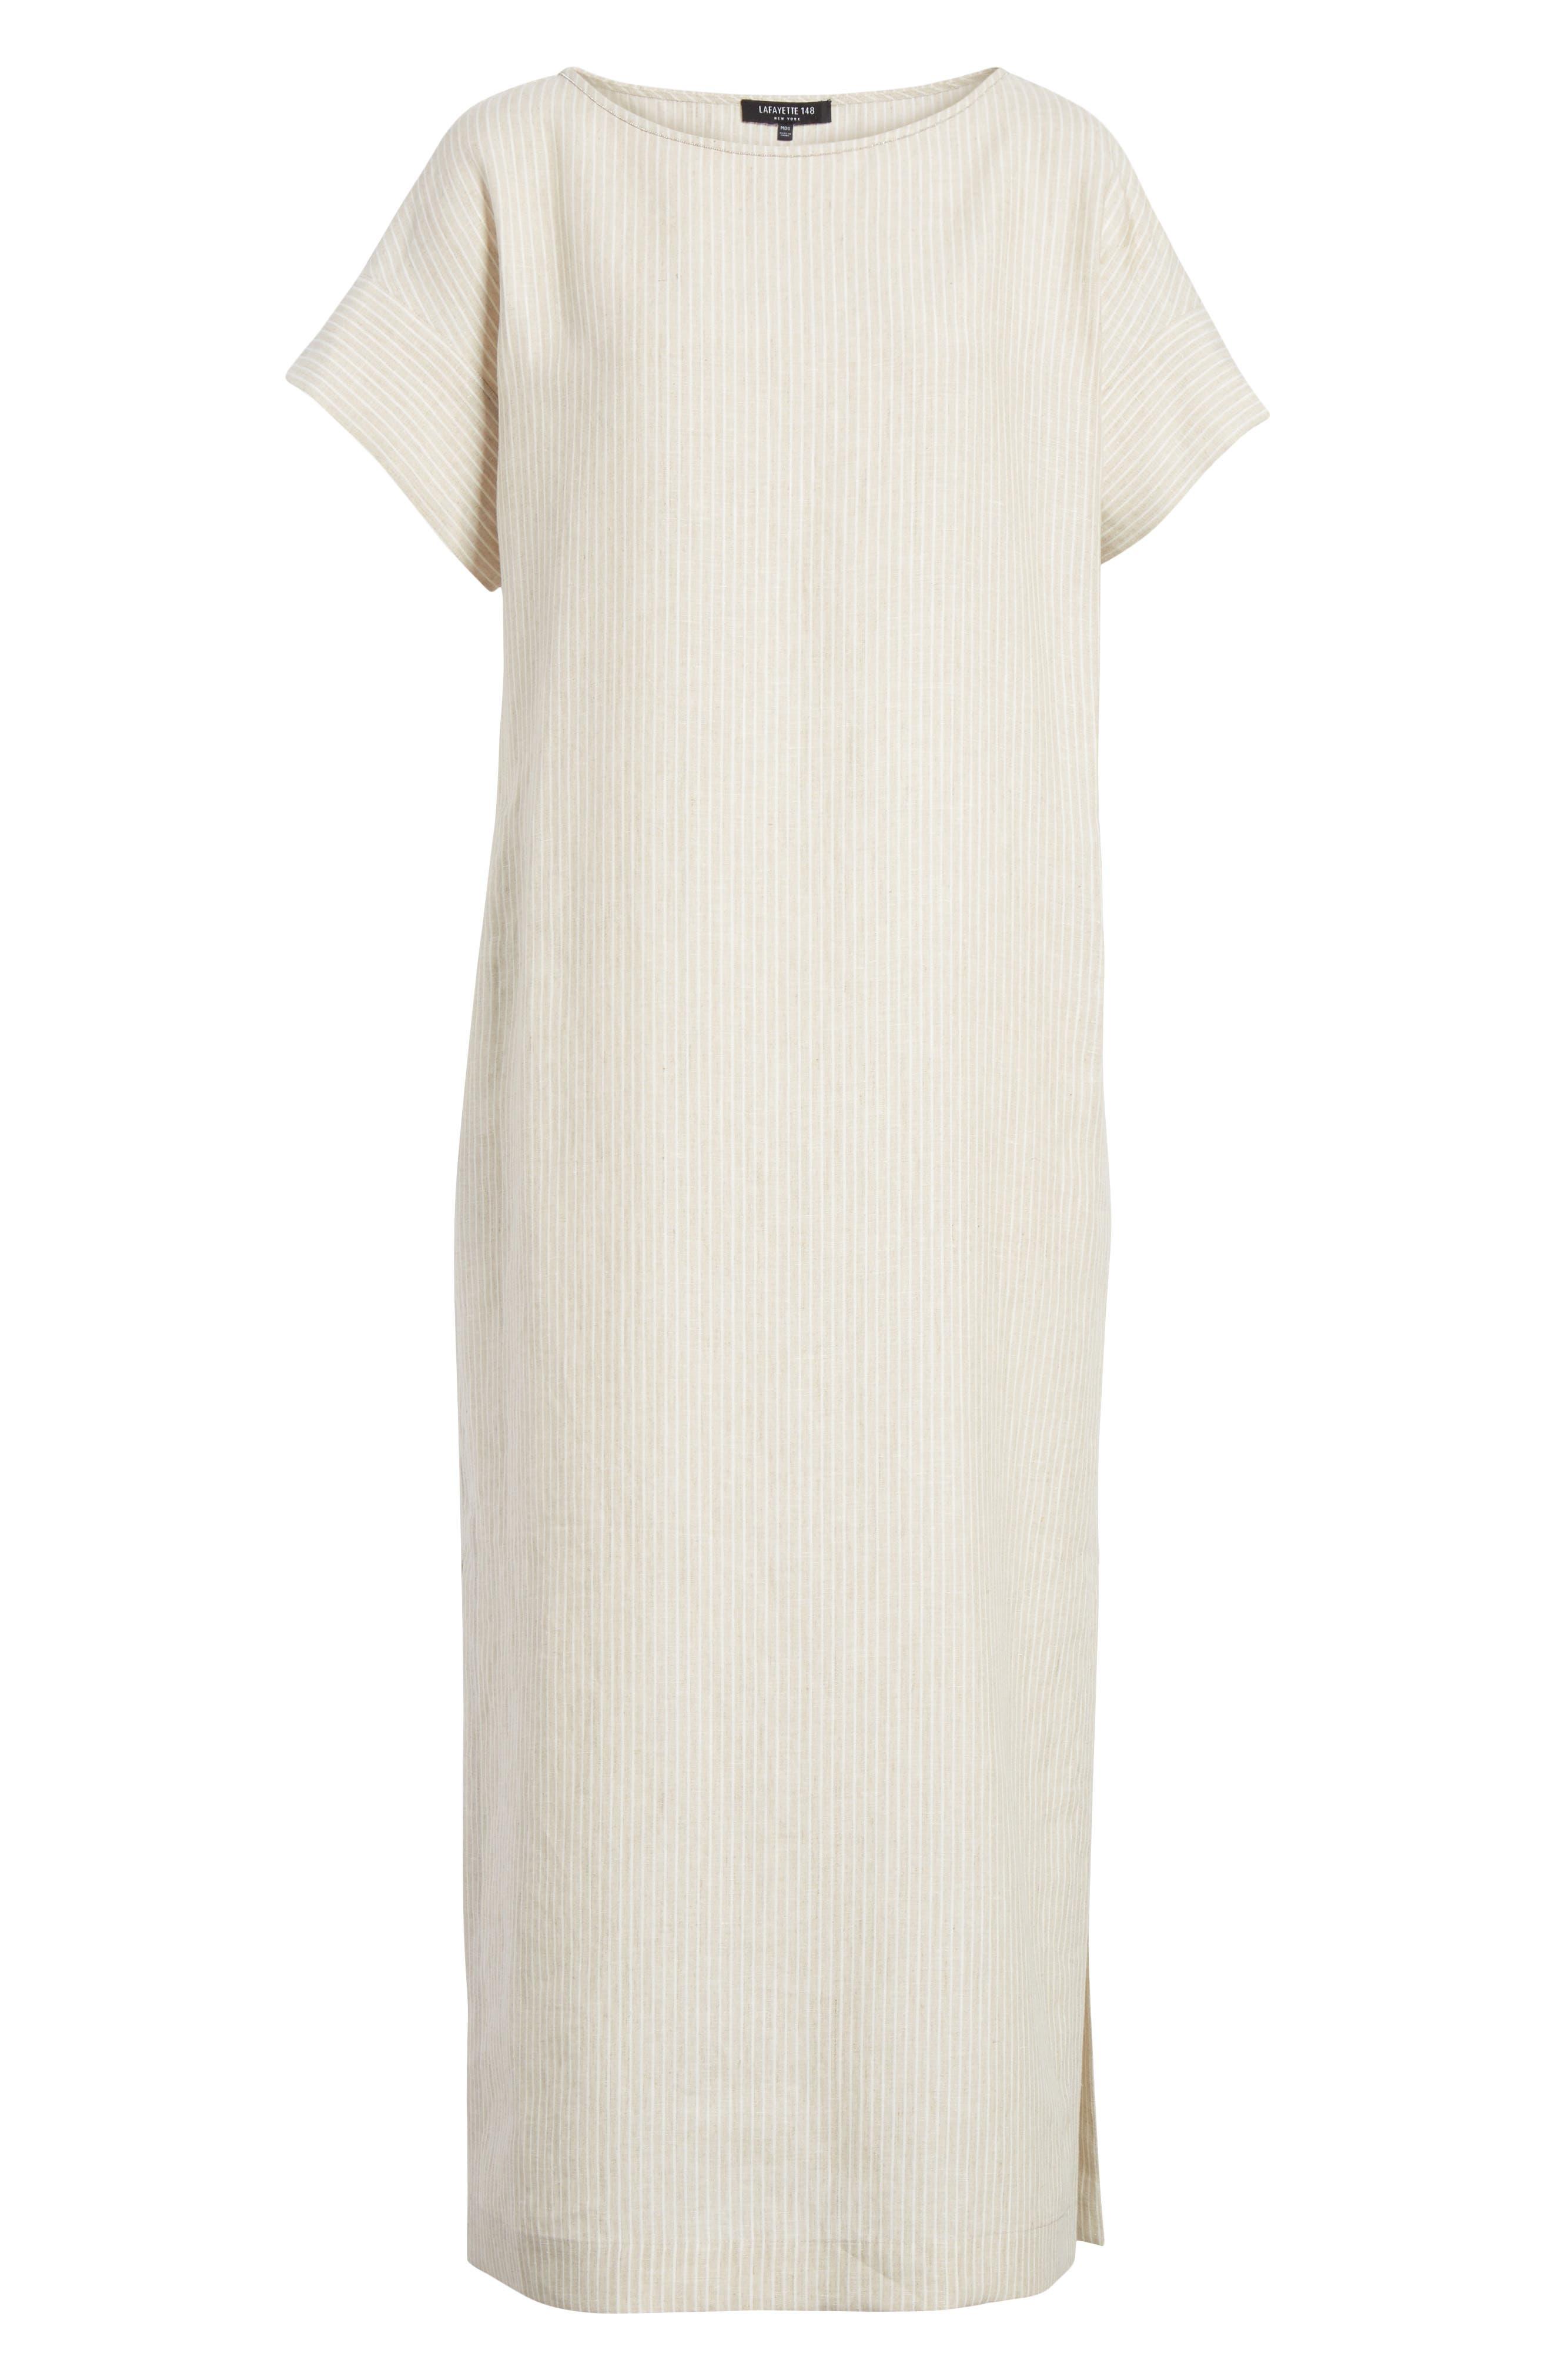 LAFAYETTE 148 NEW YORK,                             Emiline Stripe Linen Dress,                             Alternate thumbnail 6, color,                             251